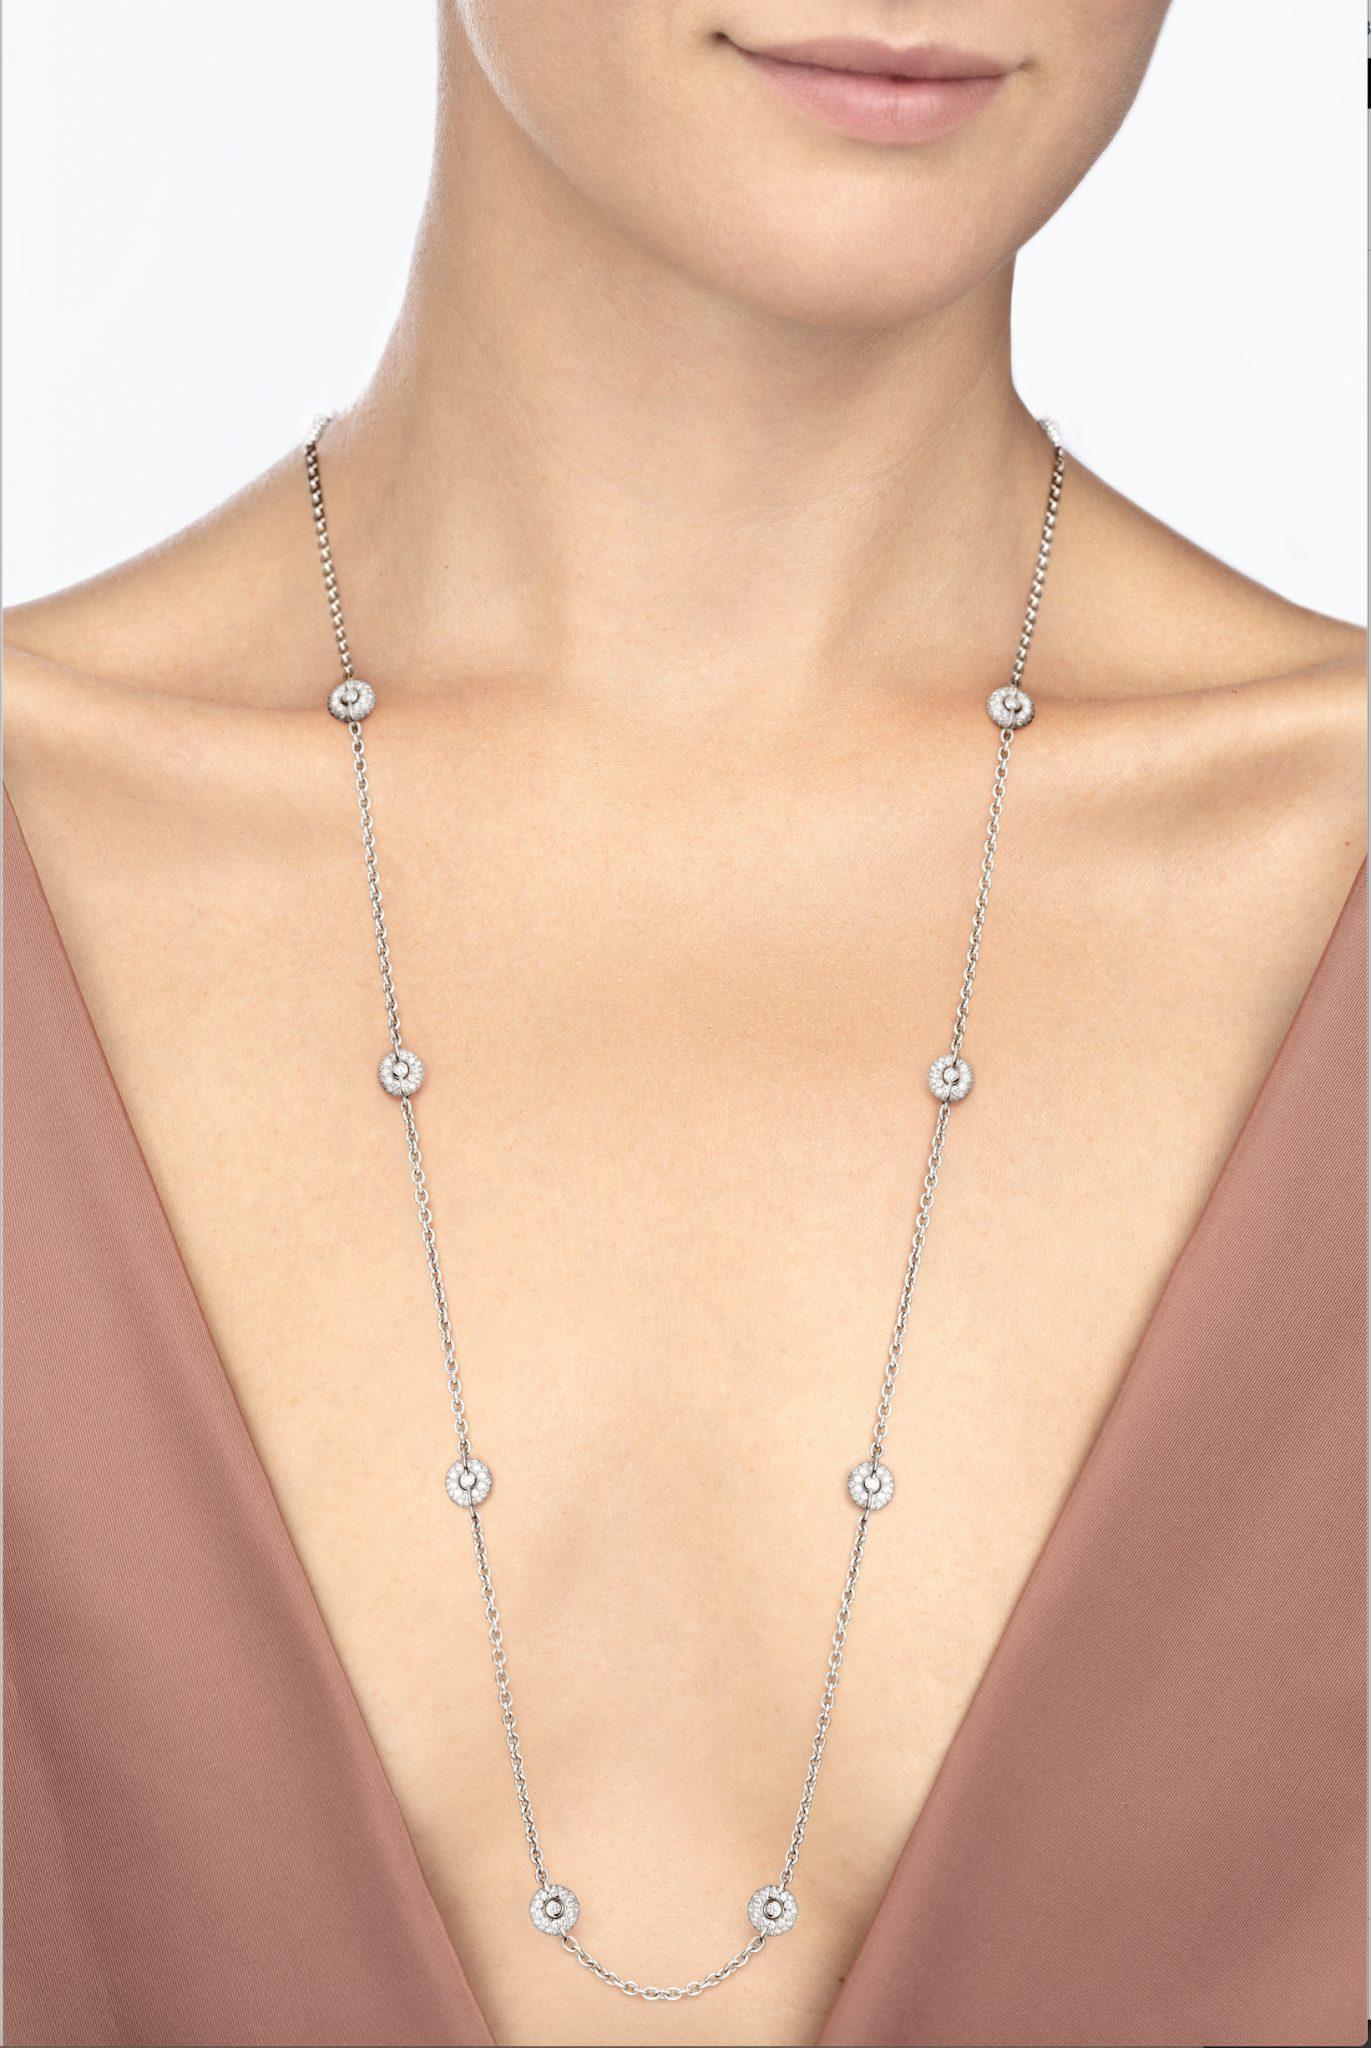 [:fr]Sautoir Diamants Or Gris[:en]White Gold Necklace With Diamonds[:] With Regard To Latest Yellow Gold Diamond Sautoir Necklaces (View 2 of 25)